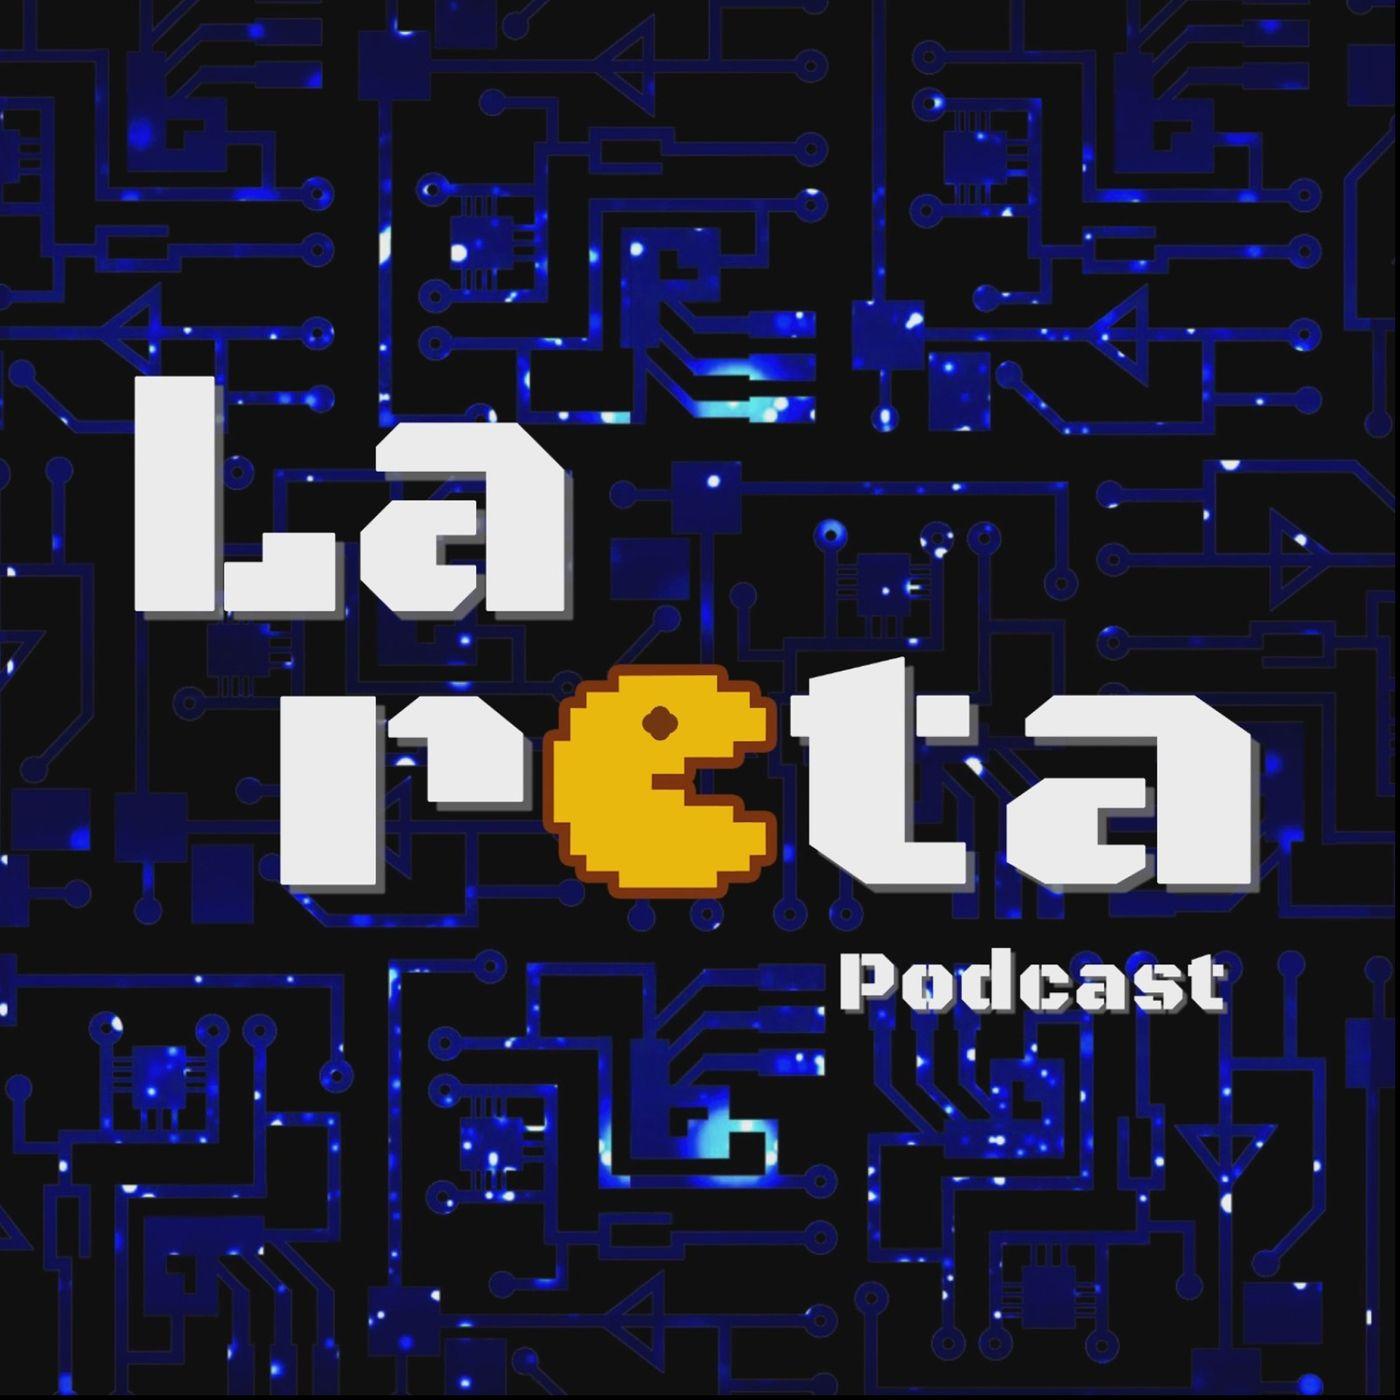 Podcast la Reta